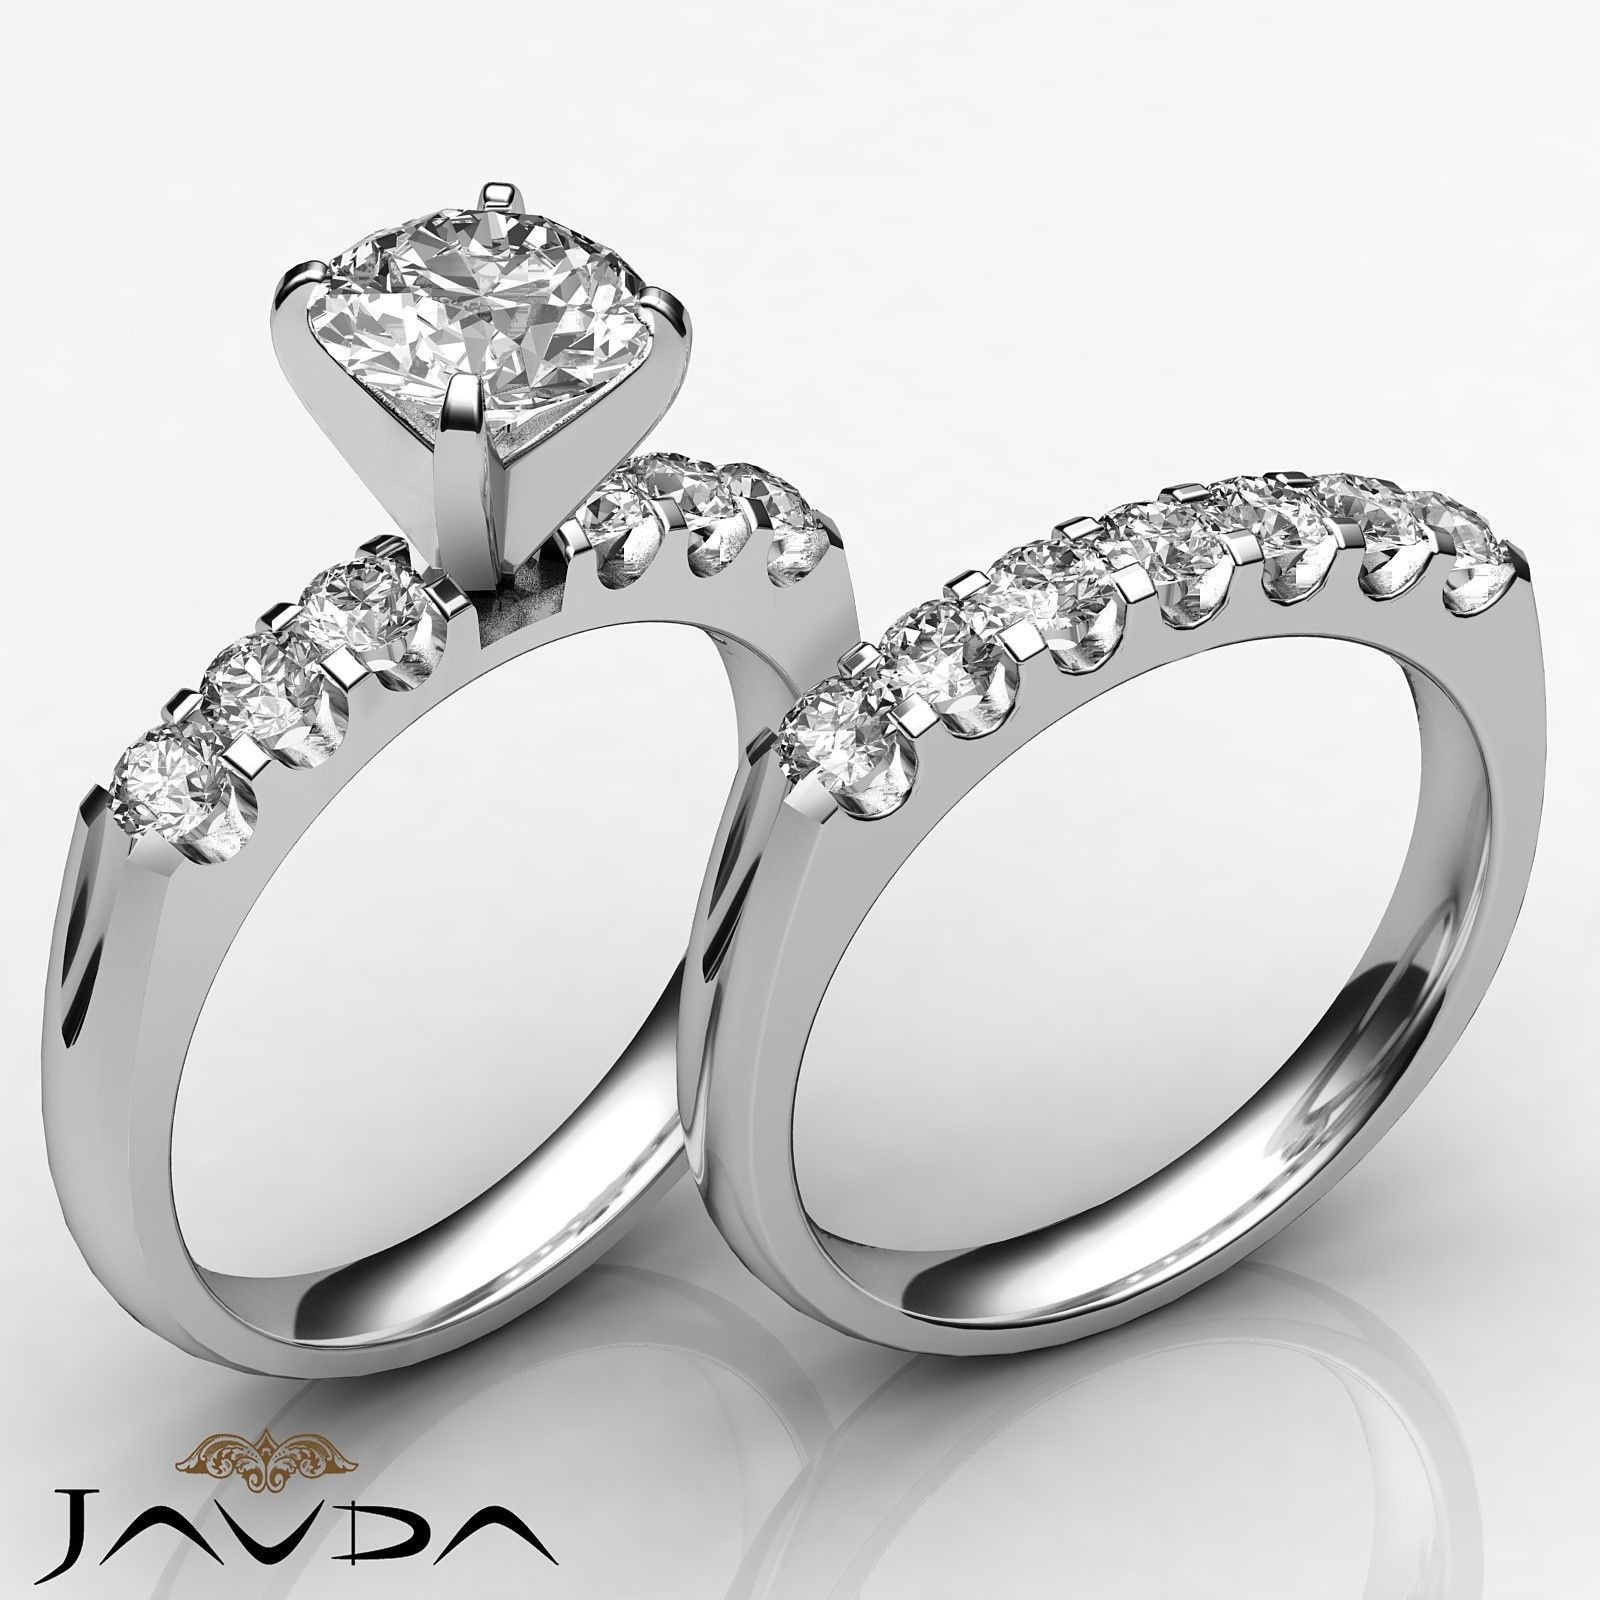 Round Diamond Women's Engagement Bridal Set Ring GIA I VS2 14k White Gold 1 8 Ct | eBay